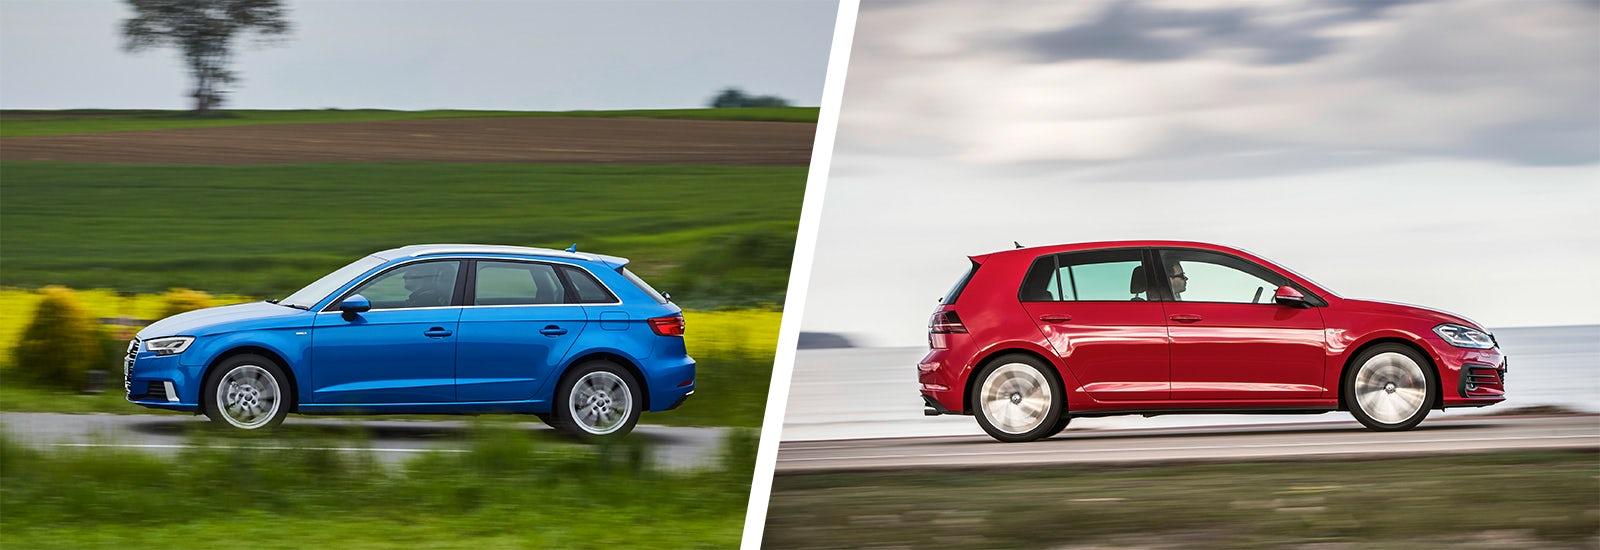 Audi A3 Vs Vw Golf Side By Side Comparison Carwow